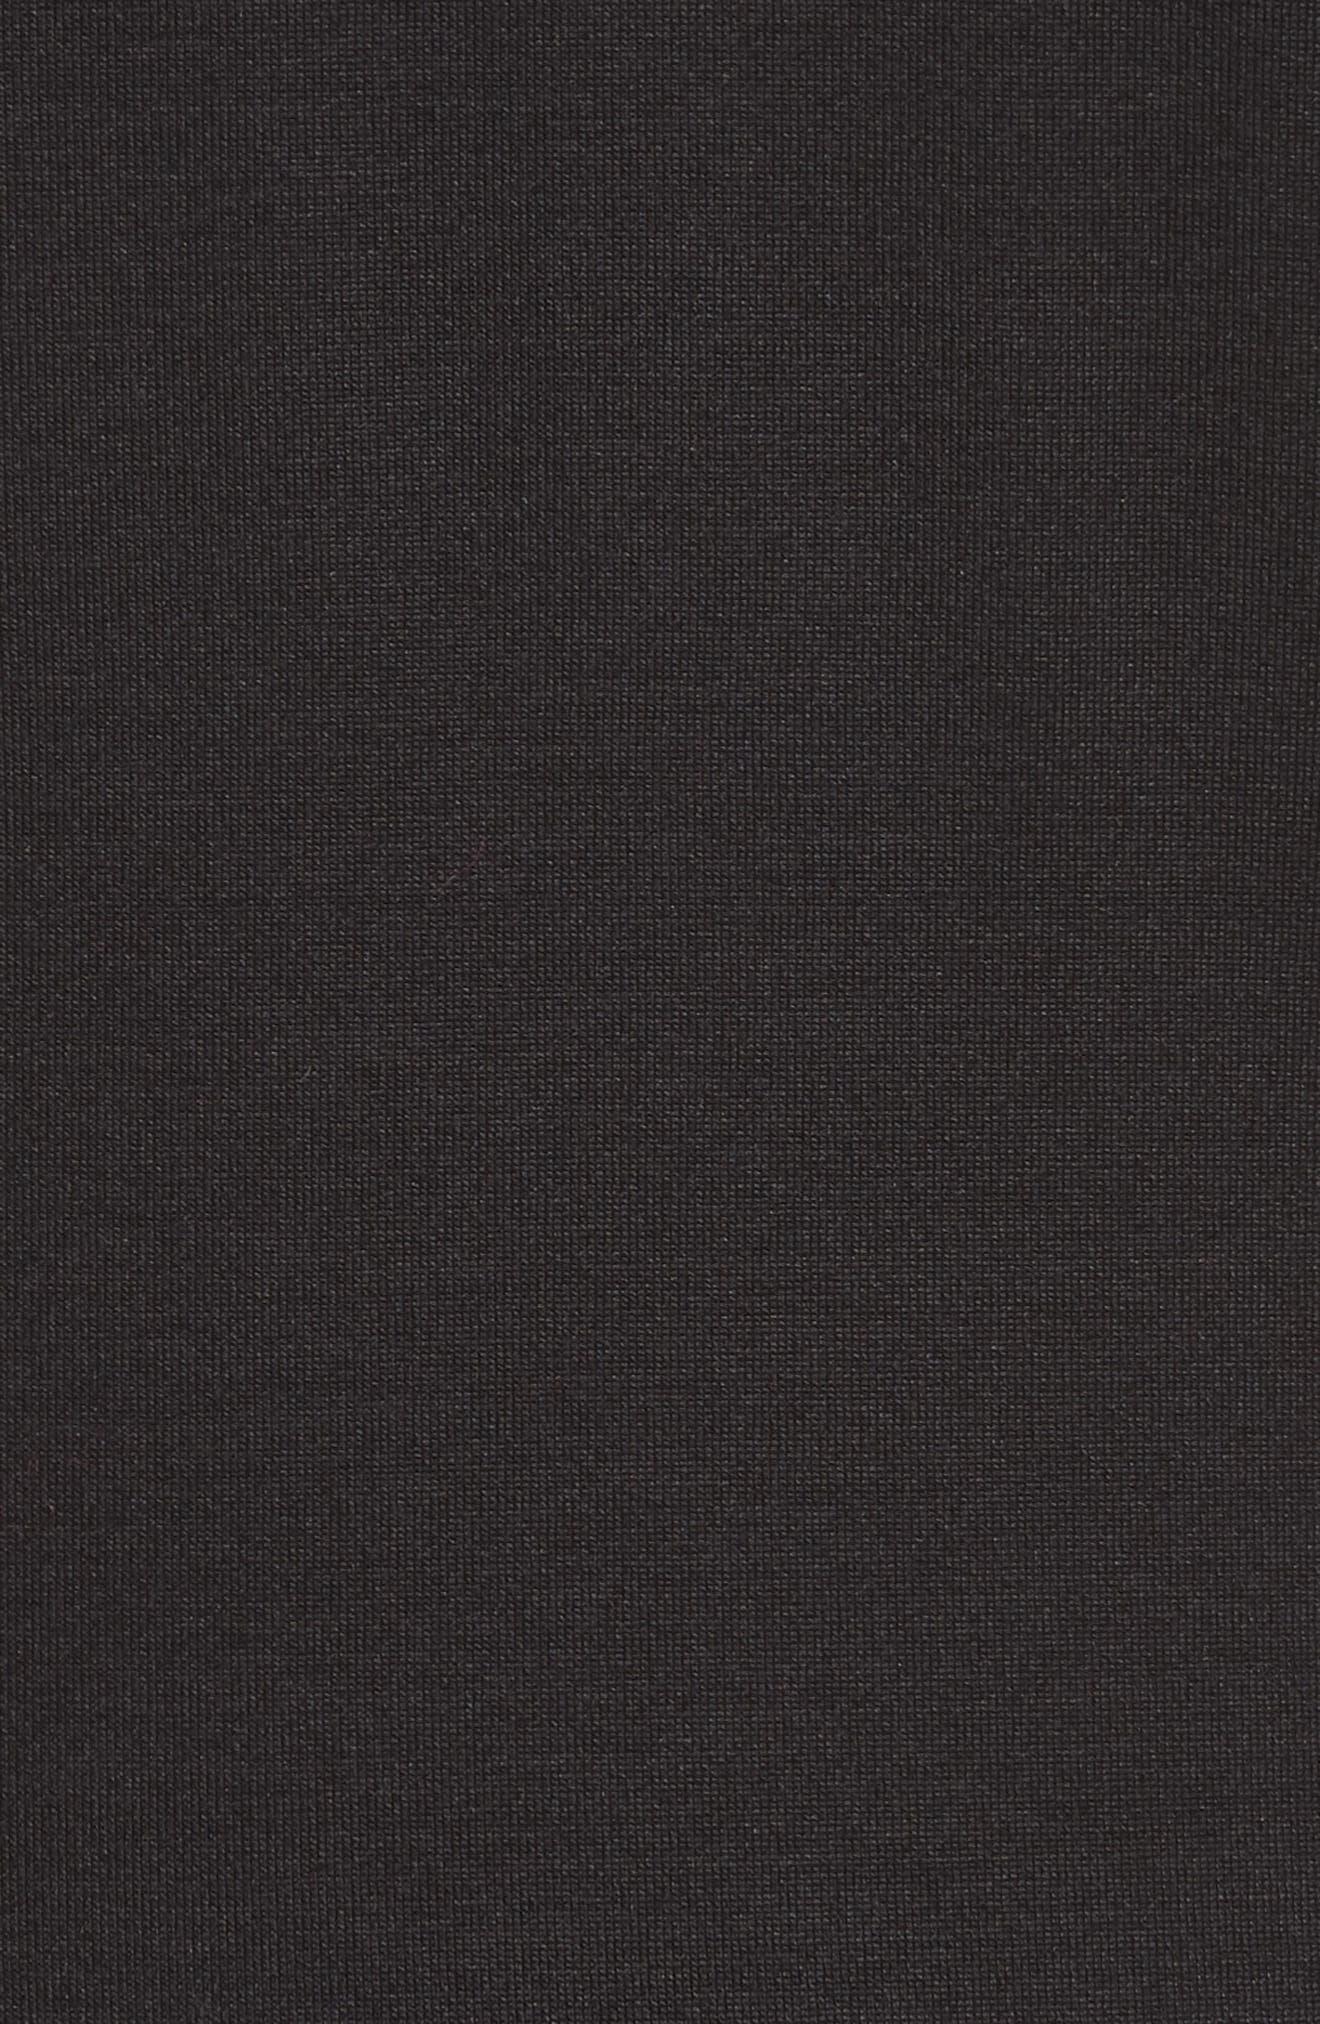 Stretch Silk Jersey Top,                             Alternate thumbnail 5, color,                             009-BLACK